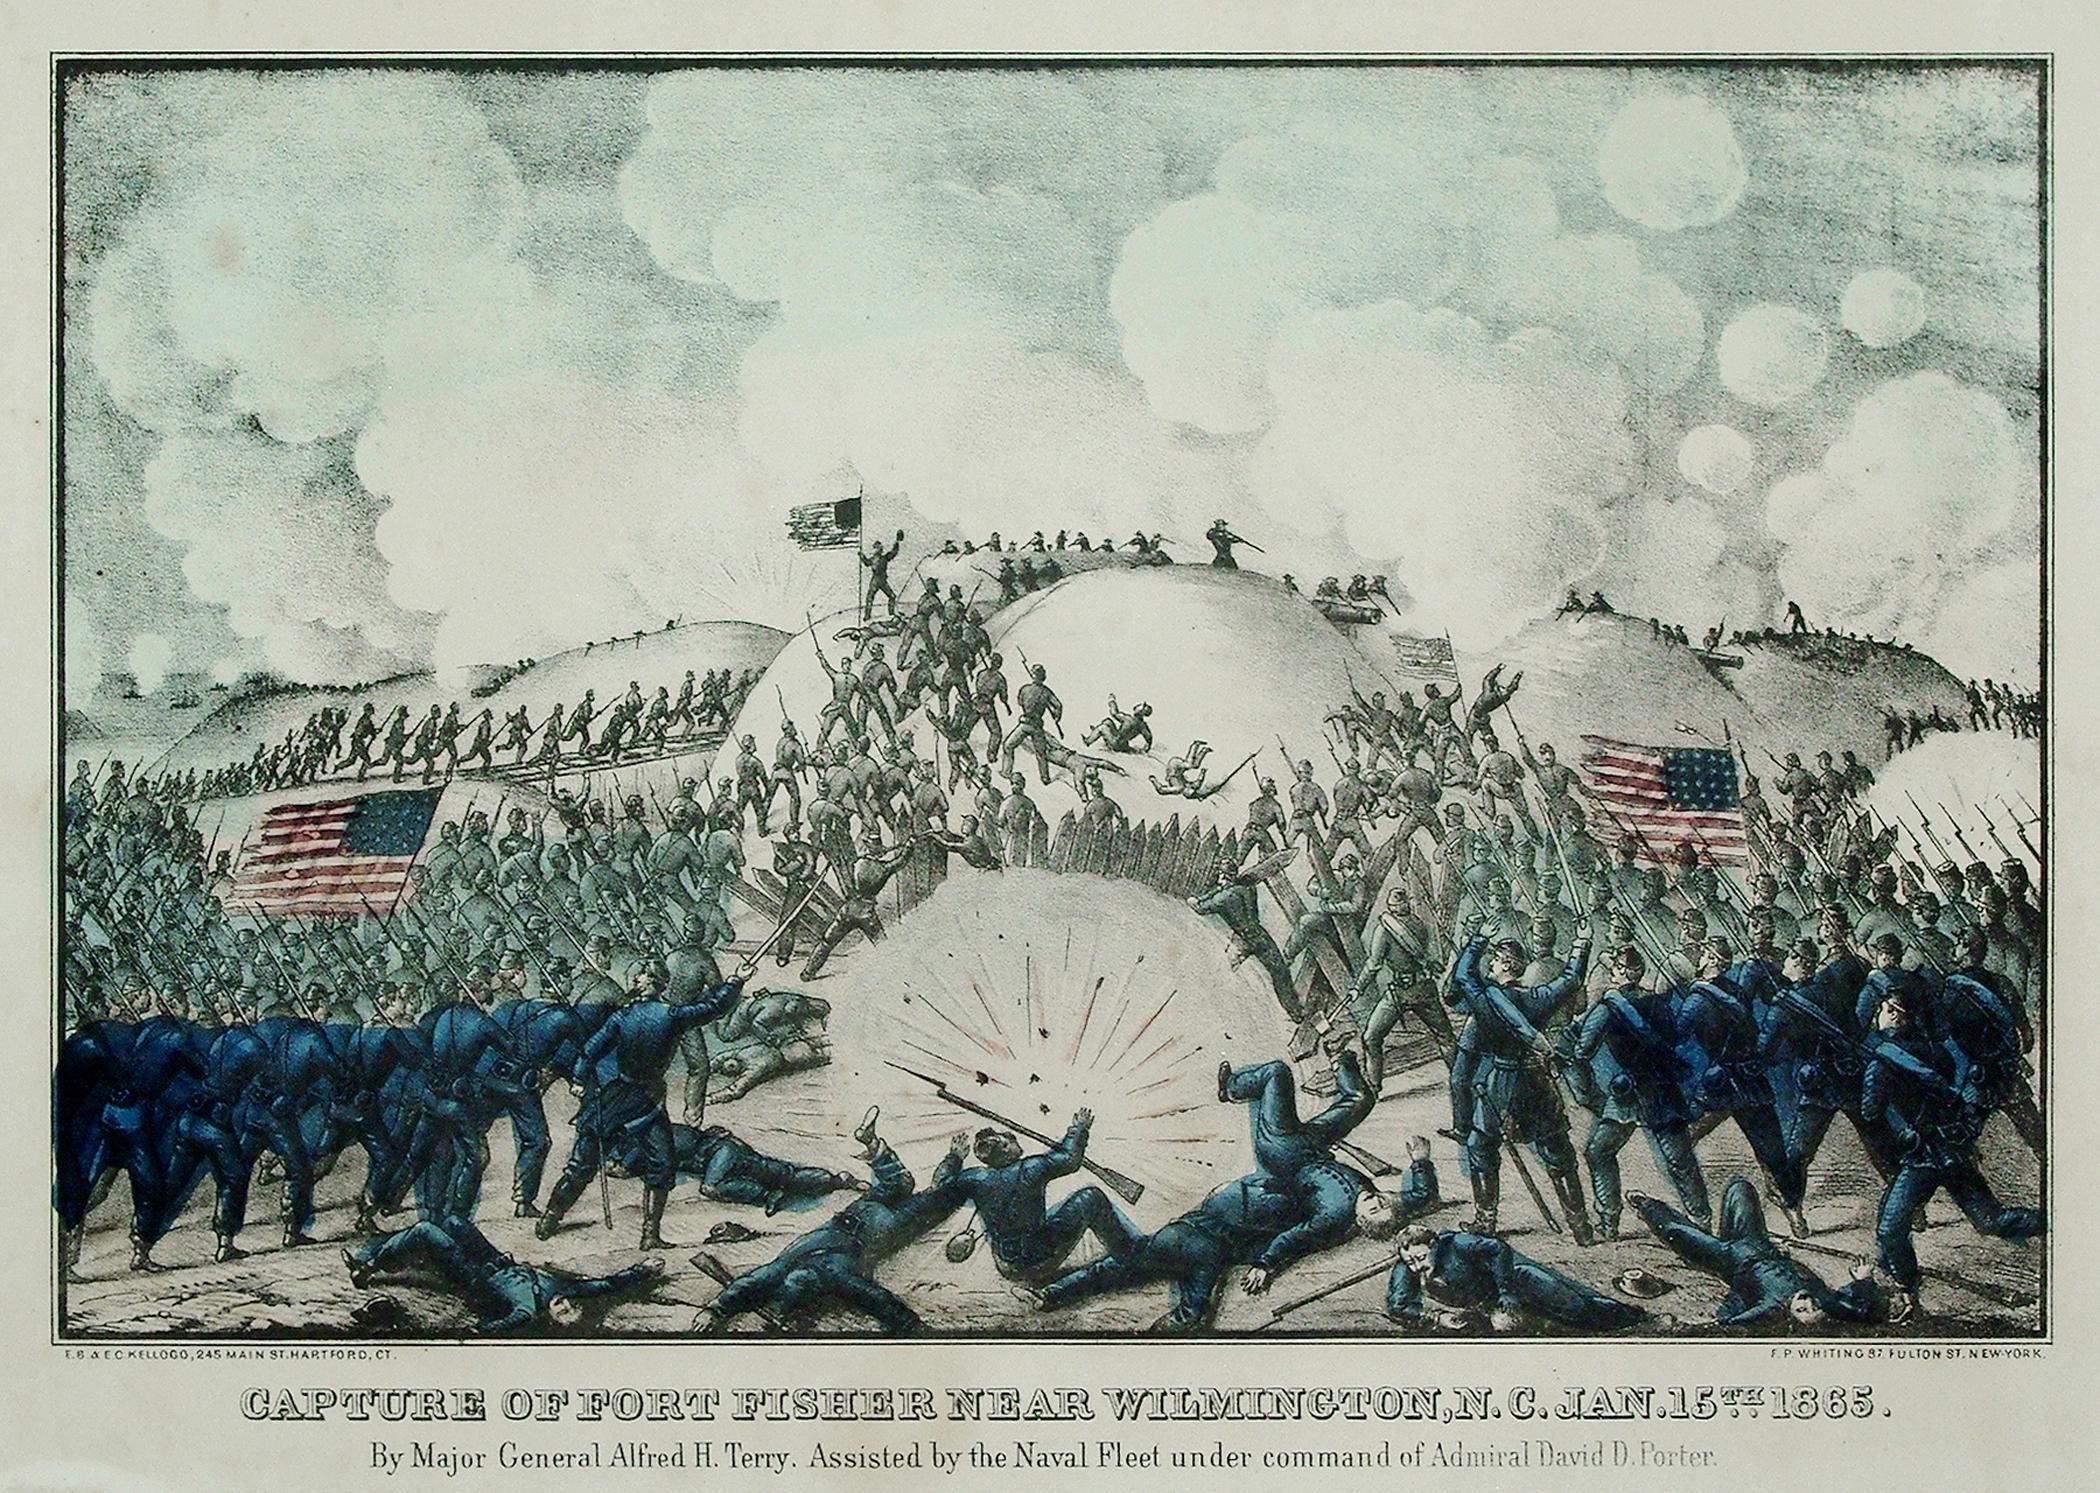 Capture of Fort Fisher Near Wilmington, N.C. Jan. 15th 1865: E. B. Kellogg & E. C. Kellogg